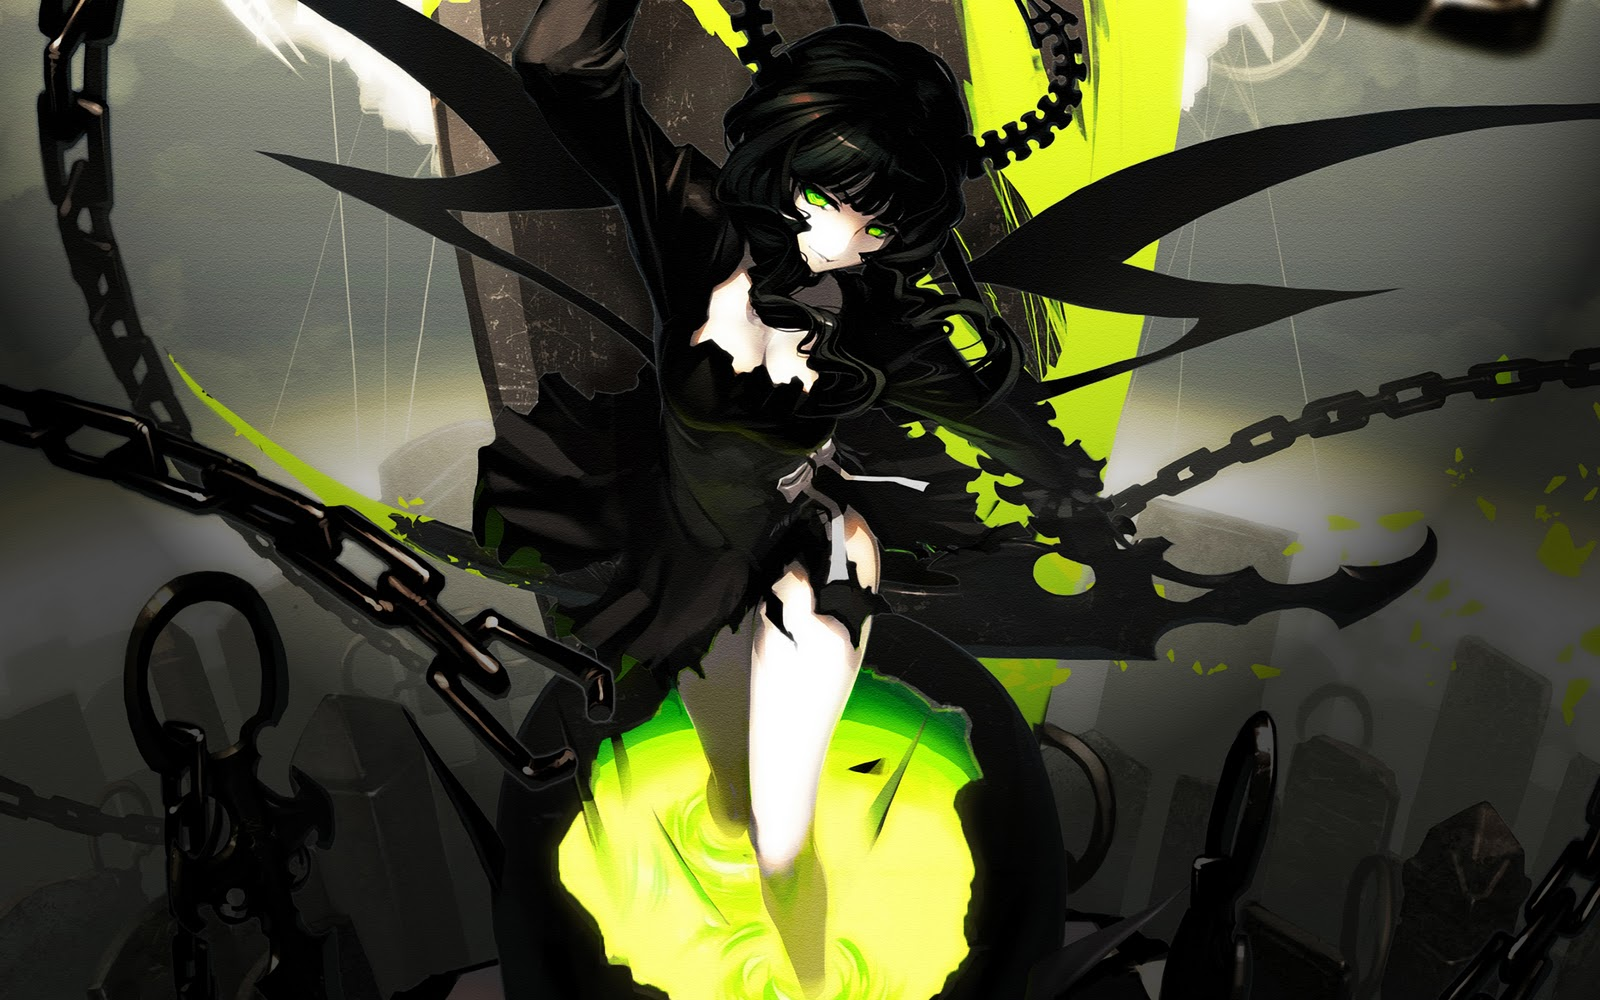 http://2.bp.blogspot.com/-HkYeIWVJ2MI/TuedkN2Hn2I/AAAAAAAADoI/rGVvMO8opCs/s1600/Konachan.com+-+119781+black_rock_shooter+chain+death_scythe+dress+green_eyes+horns+scythe+skull+takanashi_yomi+weapon+wings.jpg